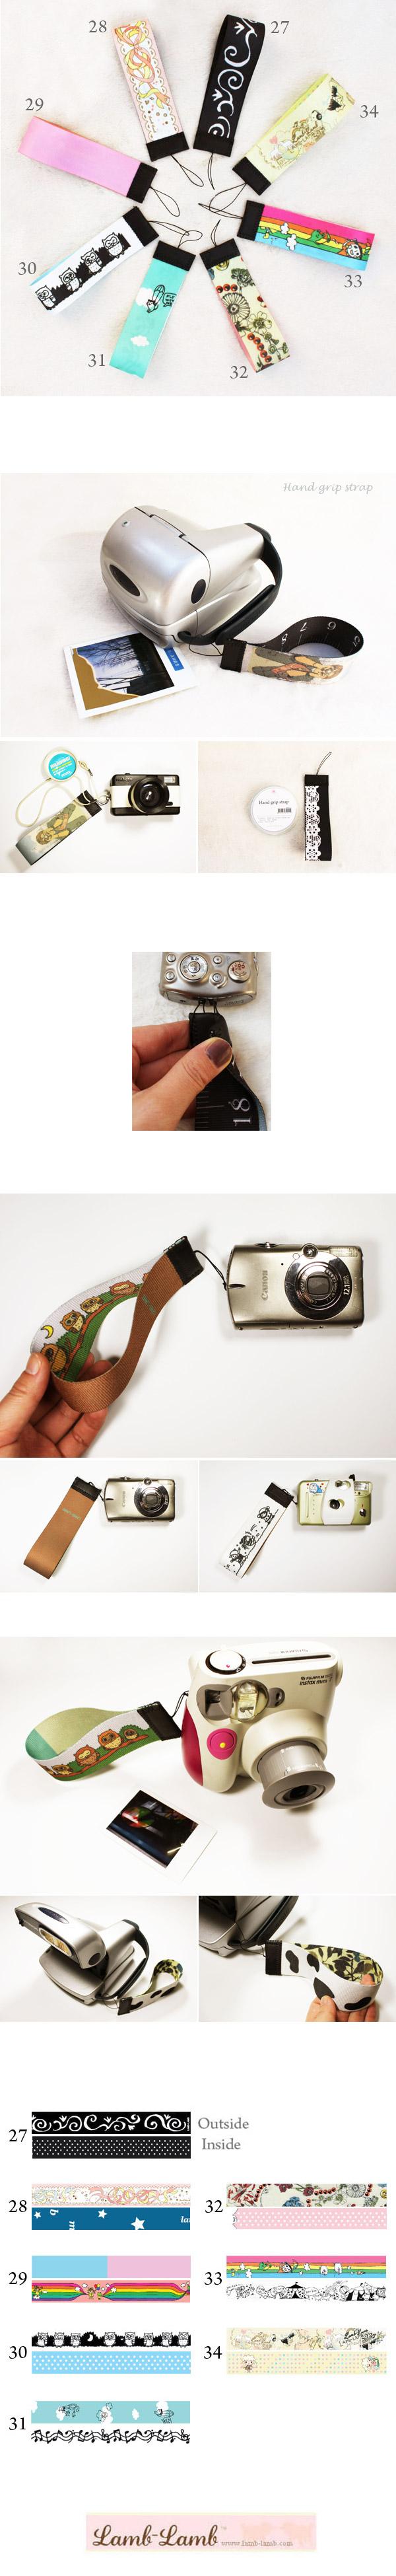 Hand grip strap 27-34 - 램램, 5,800원, 카메라 스트랩, 핸드스트랩